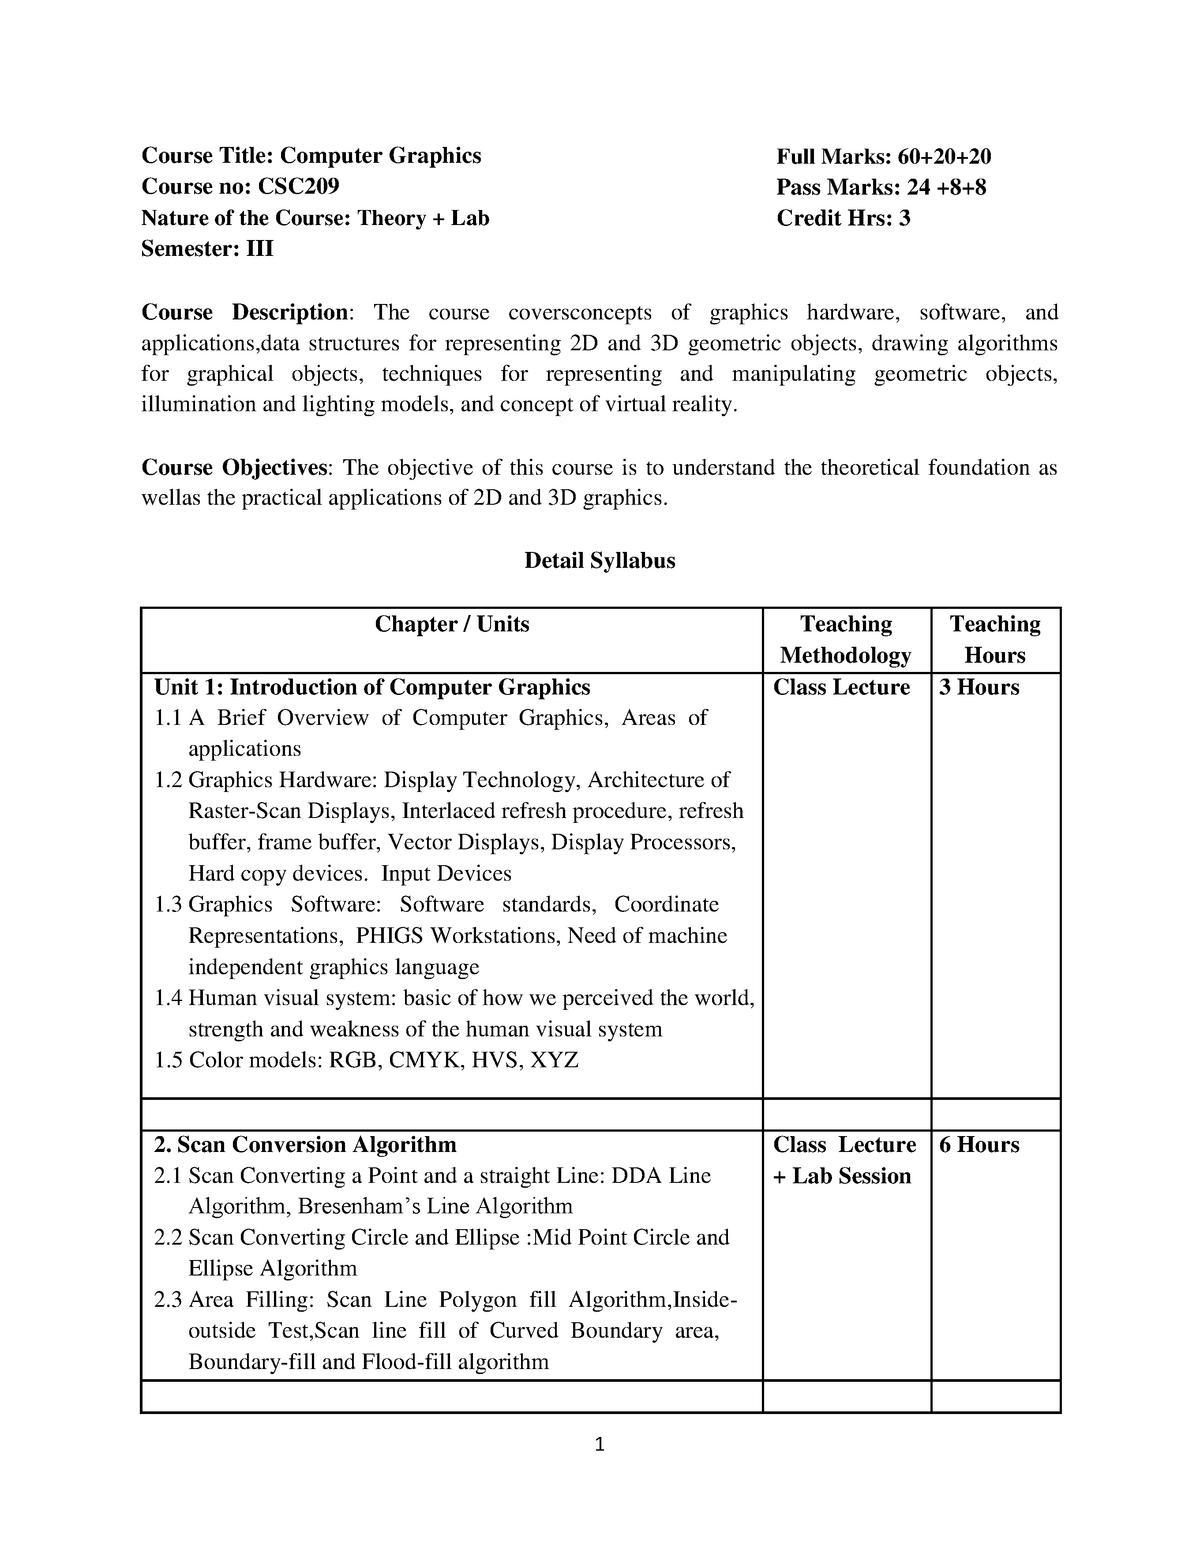 Computer Graphics (CSC209) - Introduction To IT CSC109 - StuDocu